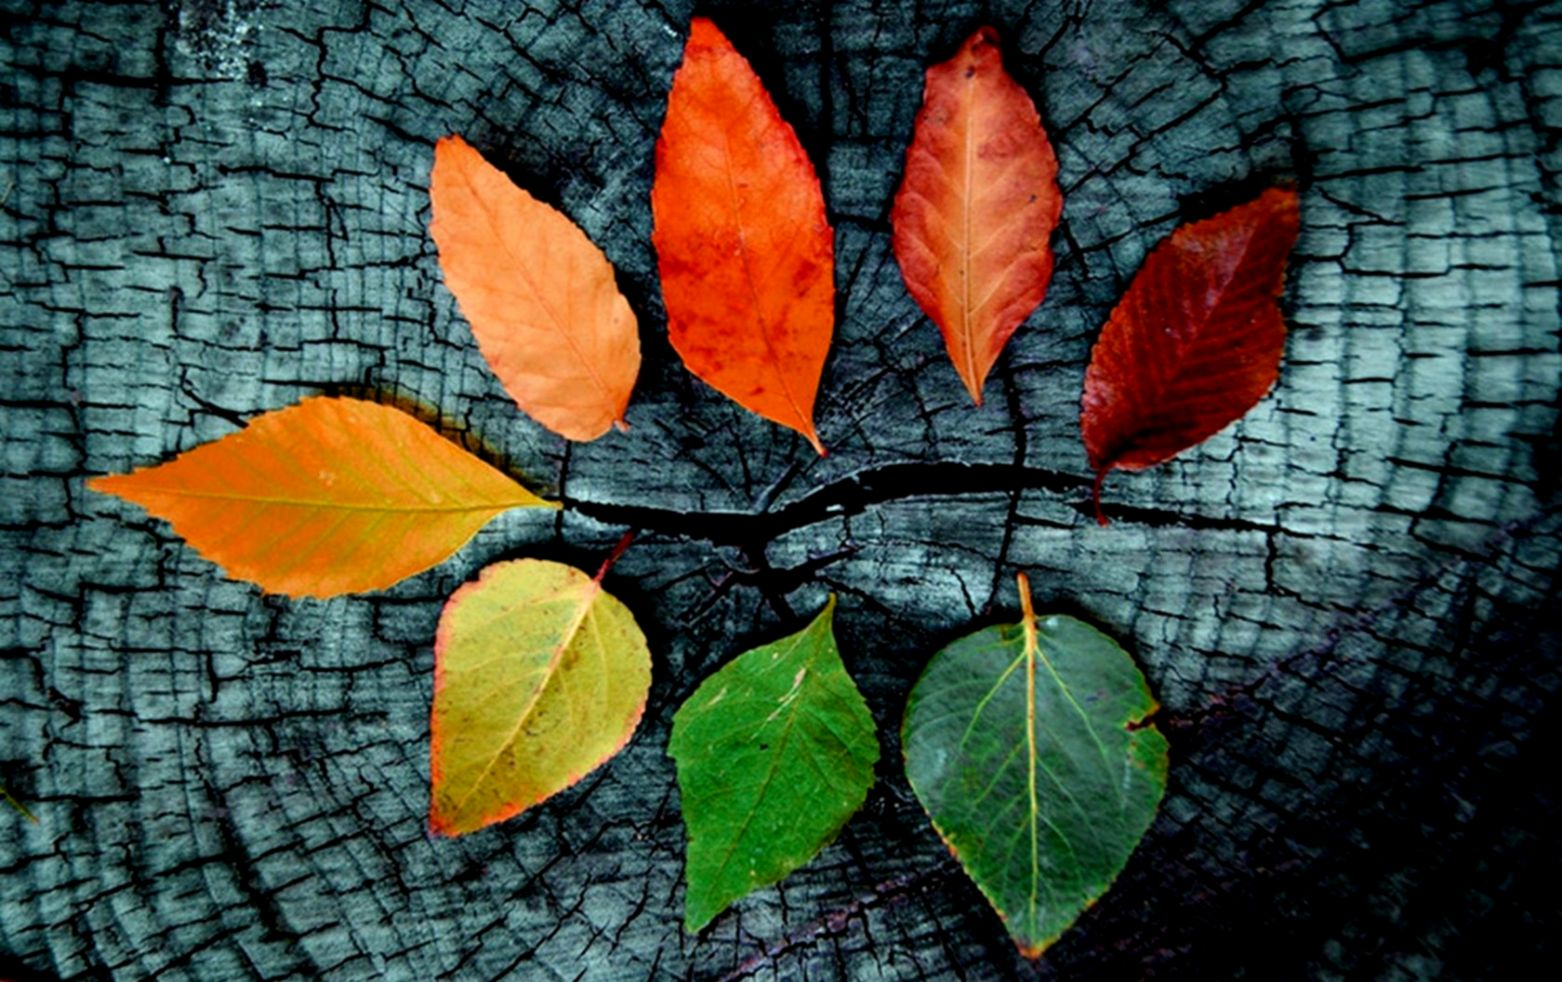 Other Autumn Tumblr Leafs Nature Fall Desktop Wallpapers - Fall Desktop Backgrounds - HD Wallpaper